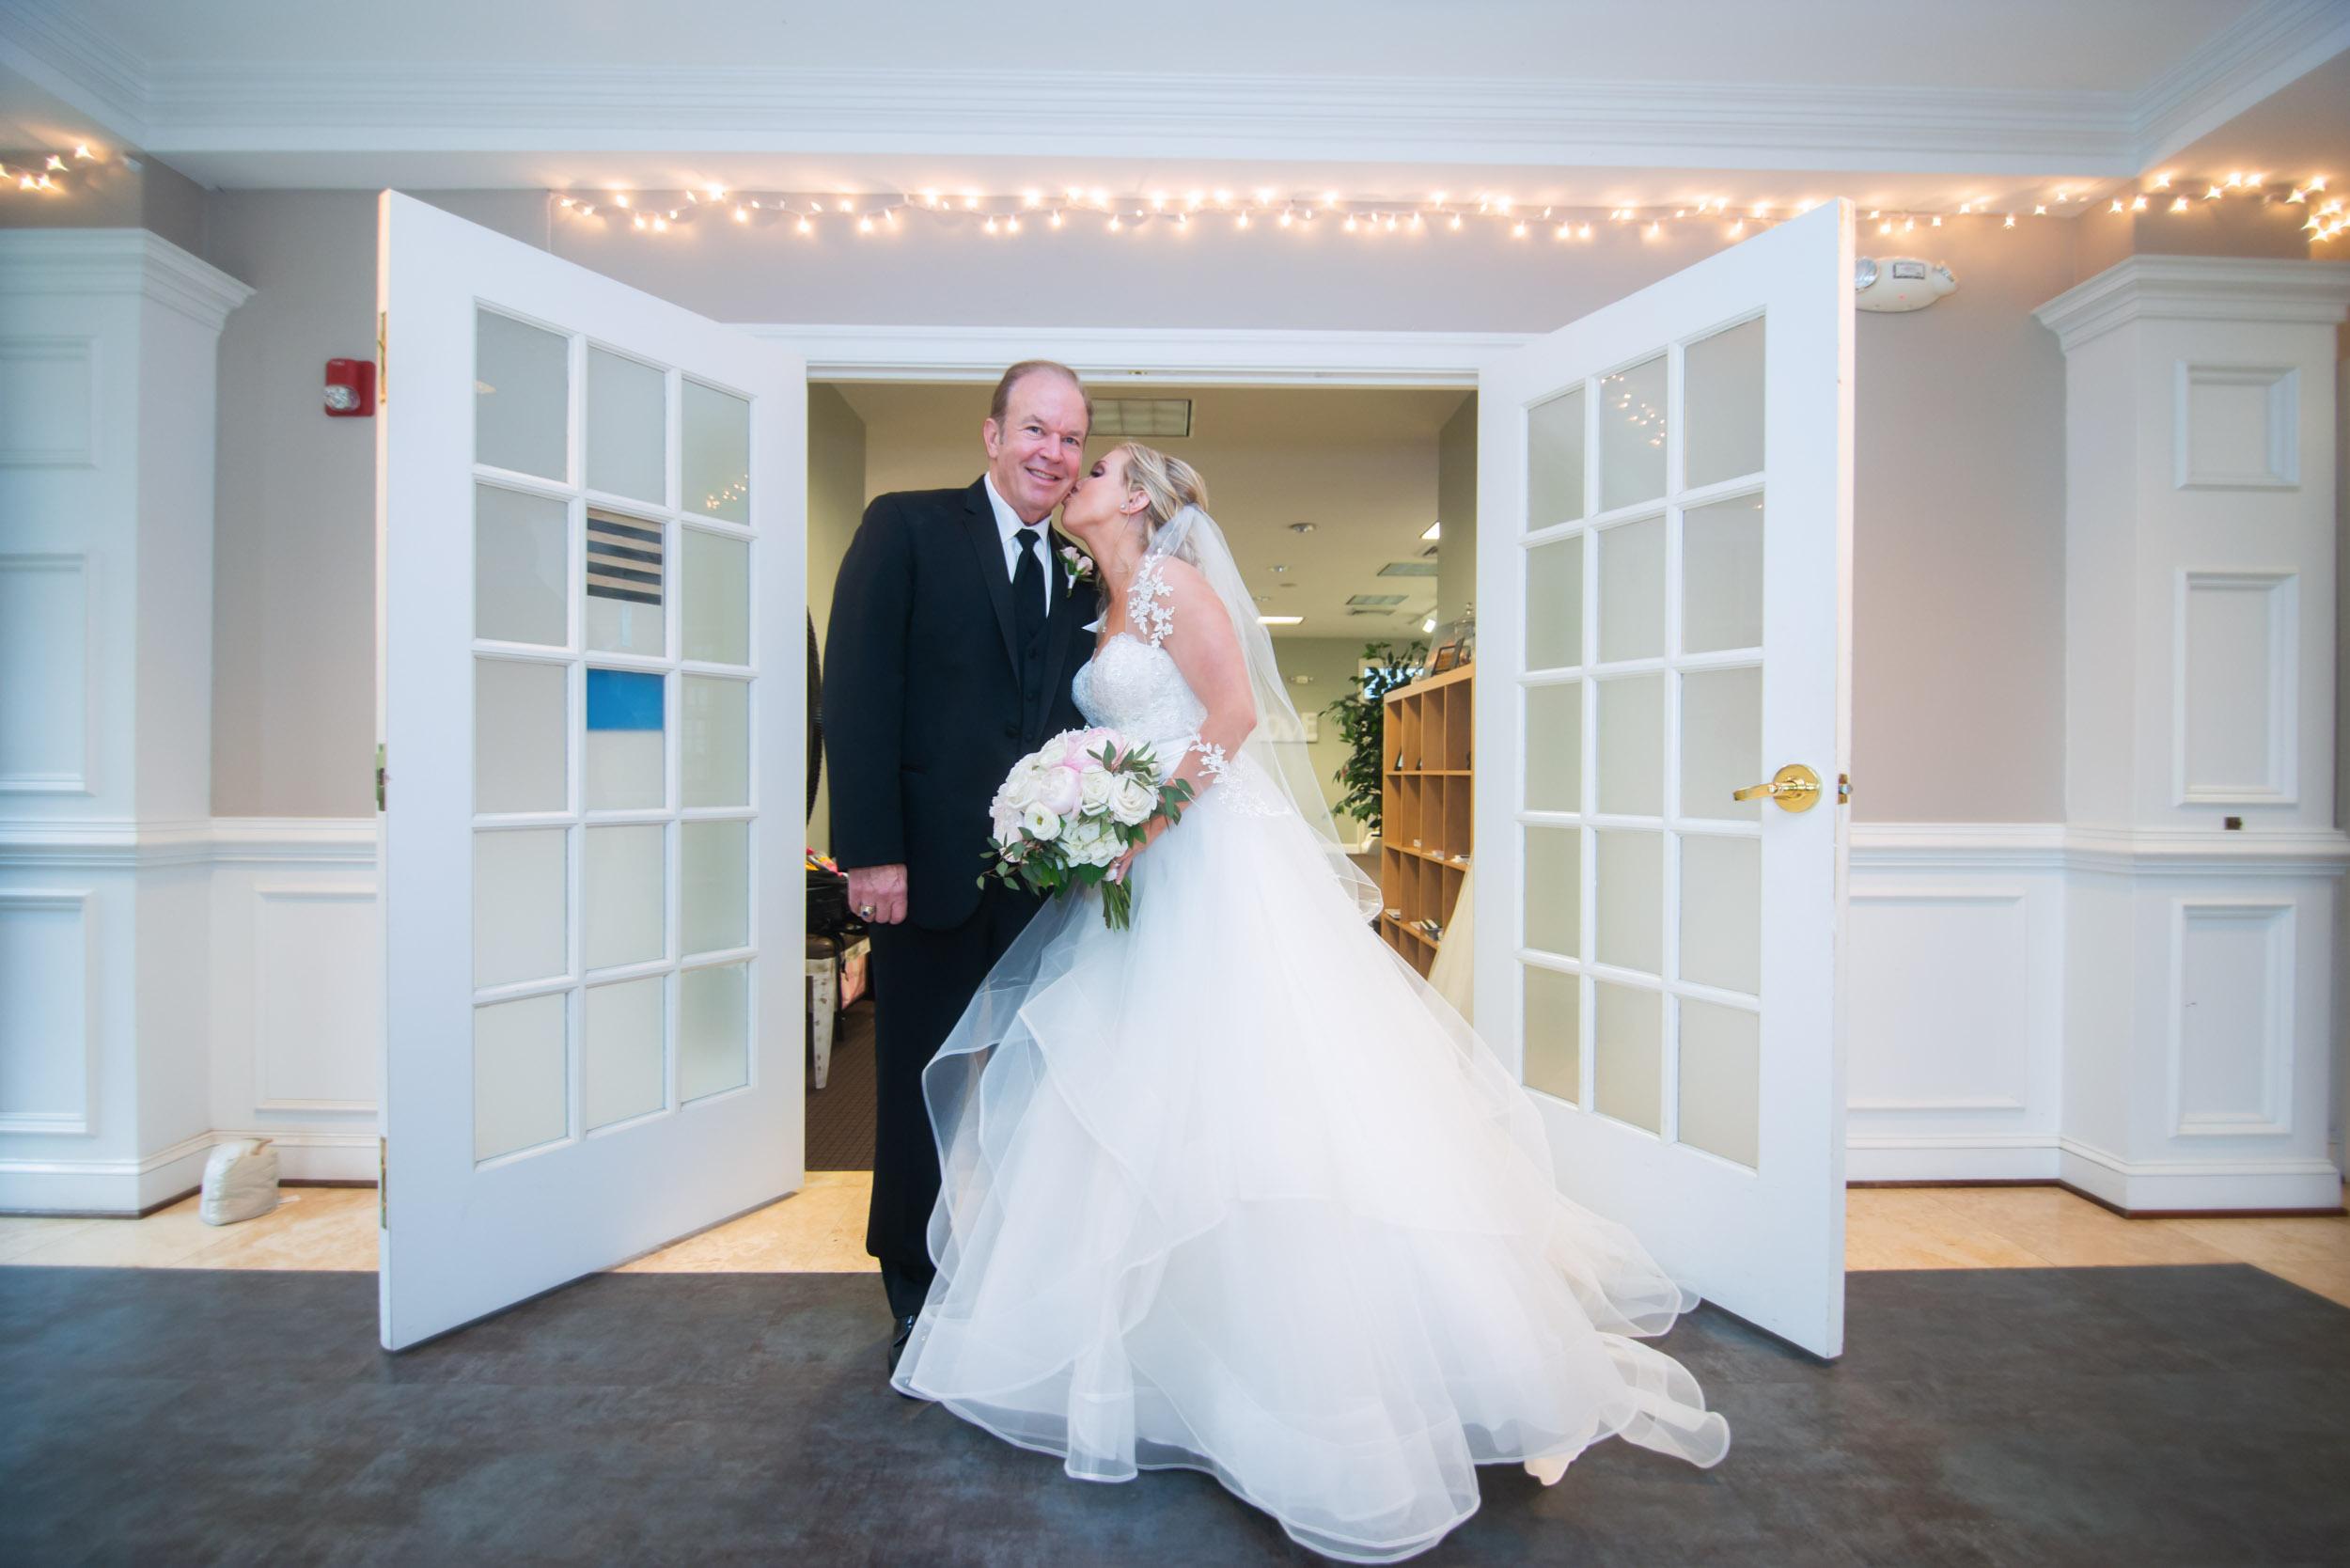 dc+metro+wedding+photographer+vadym+guliuk+photography+wedding+parent+dances-2030.jpg